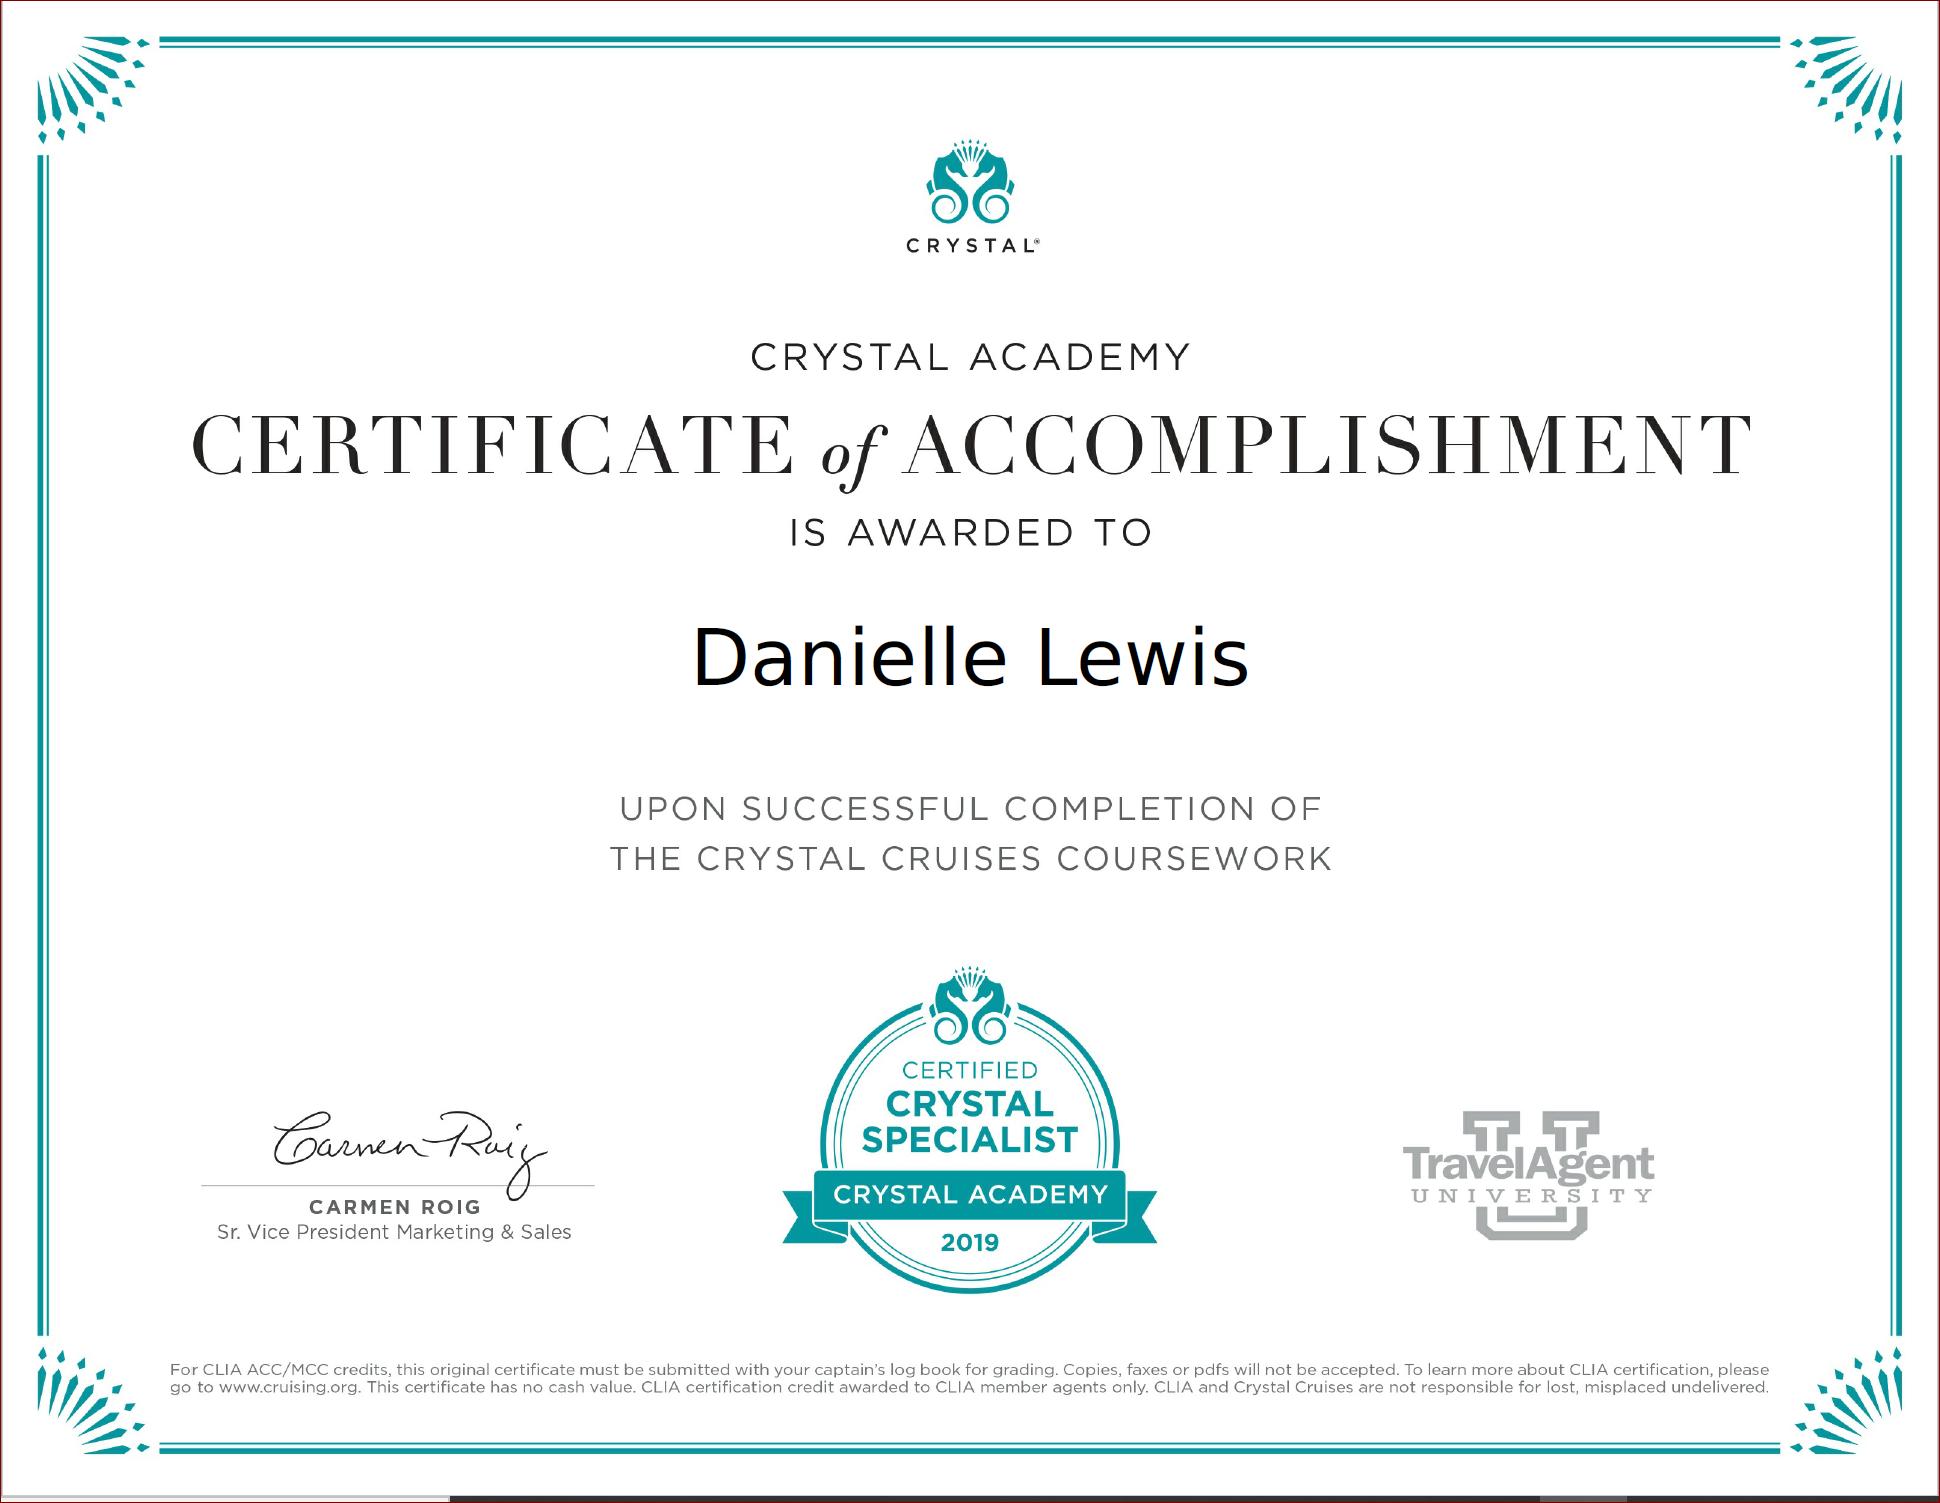 SelfishMe Travel - Crystal Cruises Crystal Ocean Cruises certificate